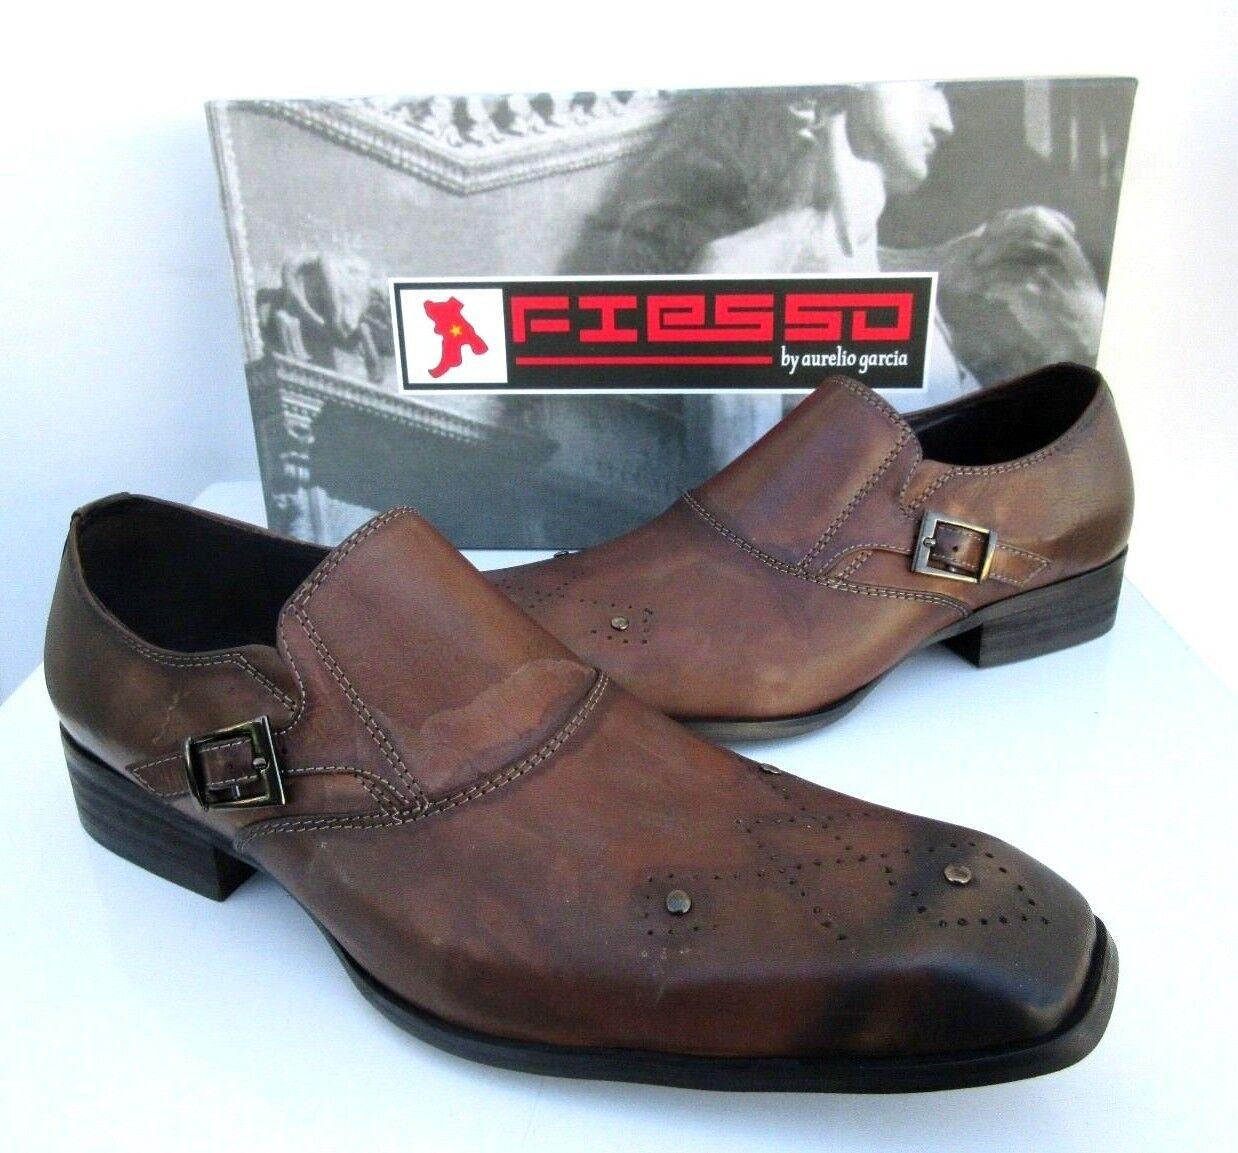 NEW Fiesso Aurelio Garcia Mens marrón Buckle Strap Loafer Style FI-8214 Talla 8